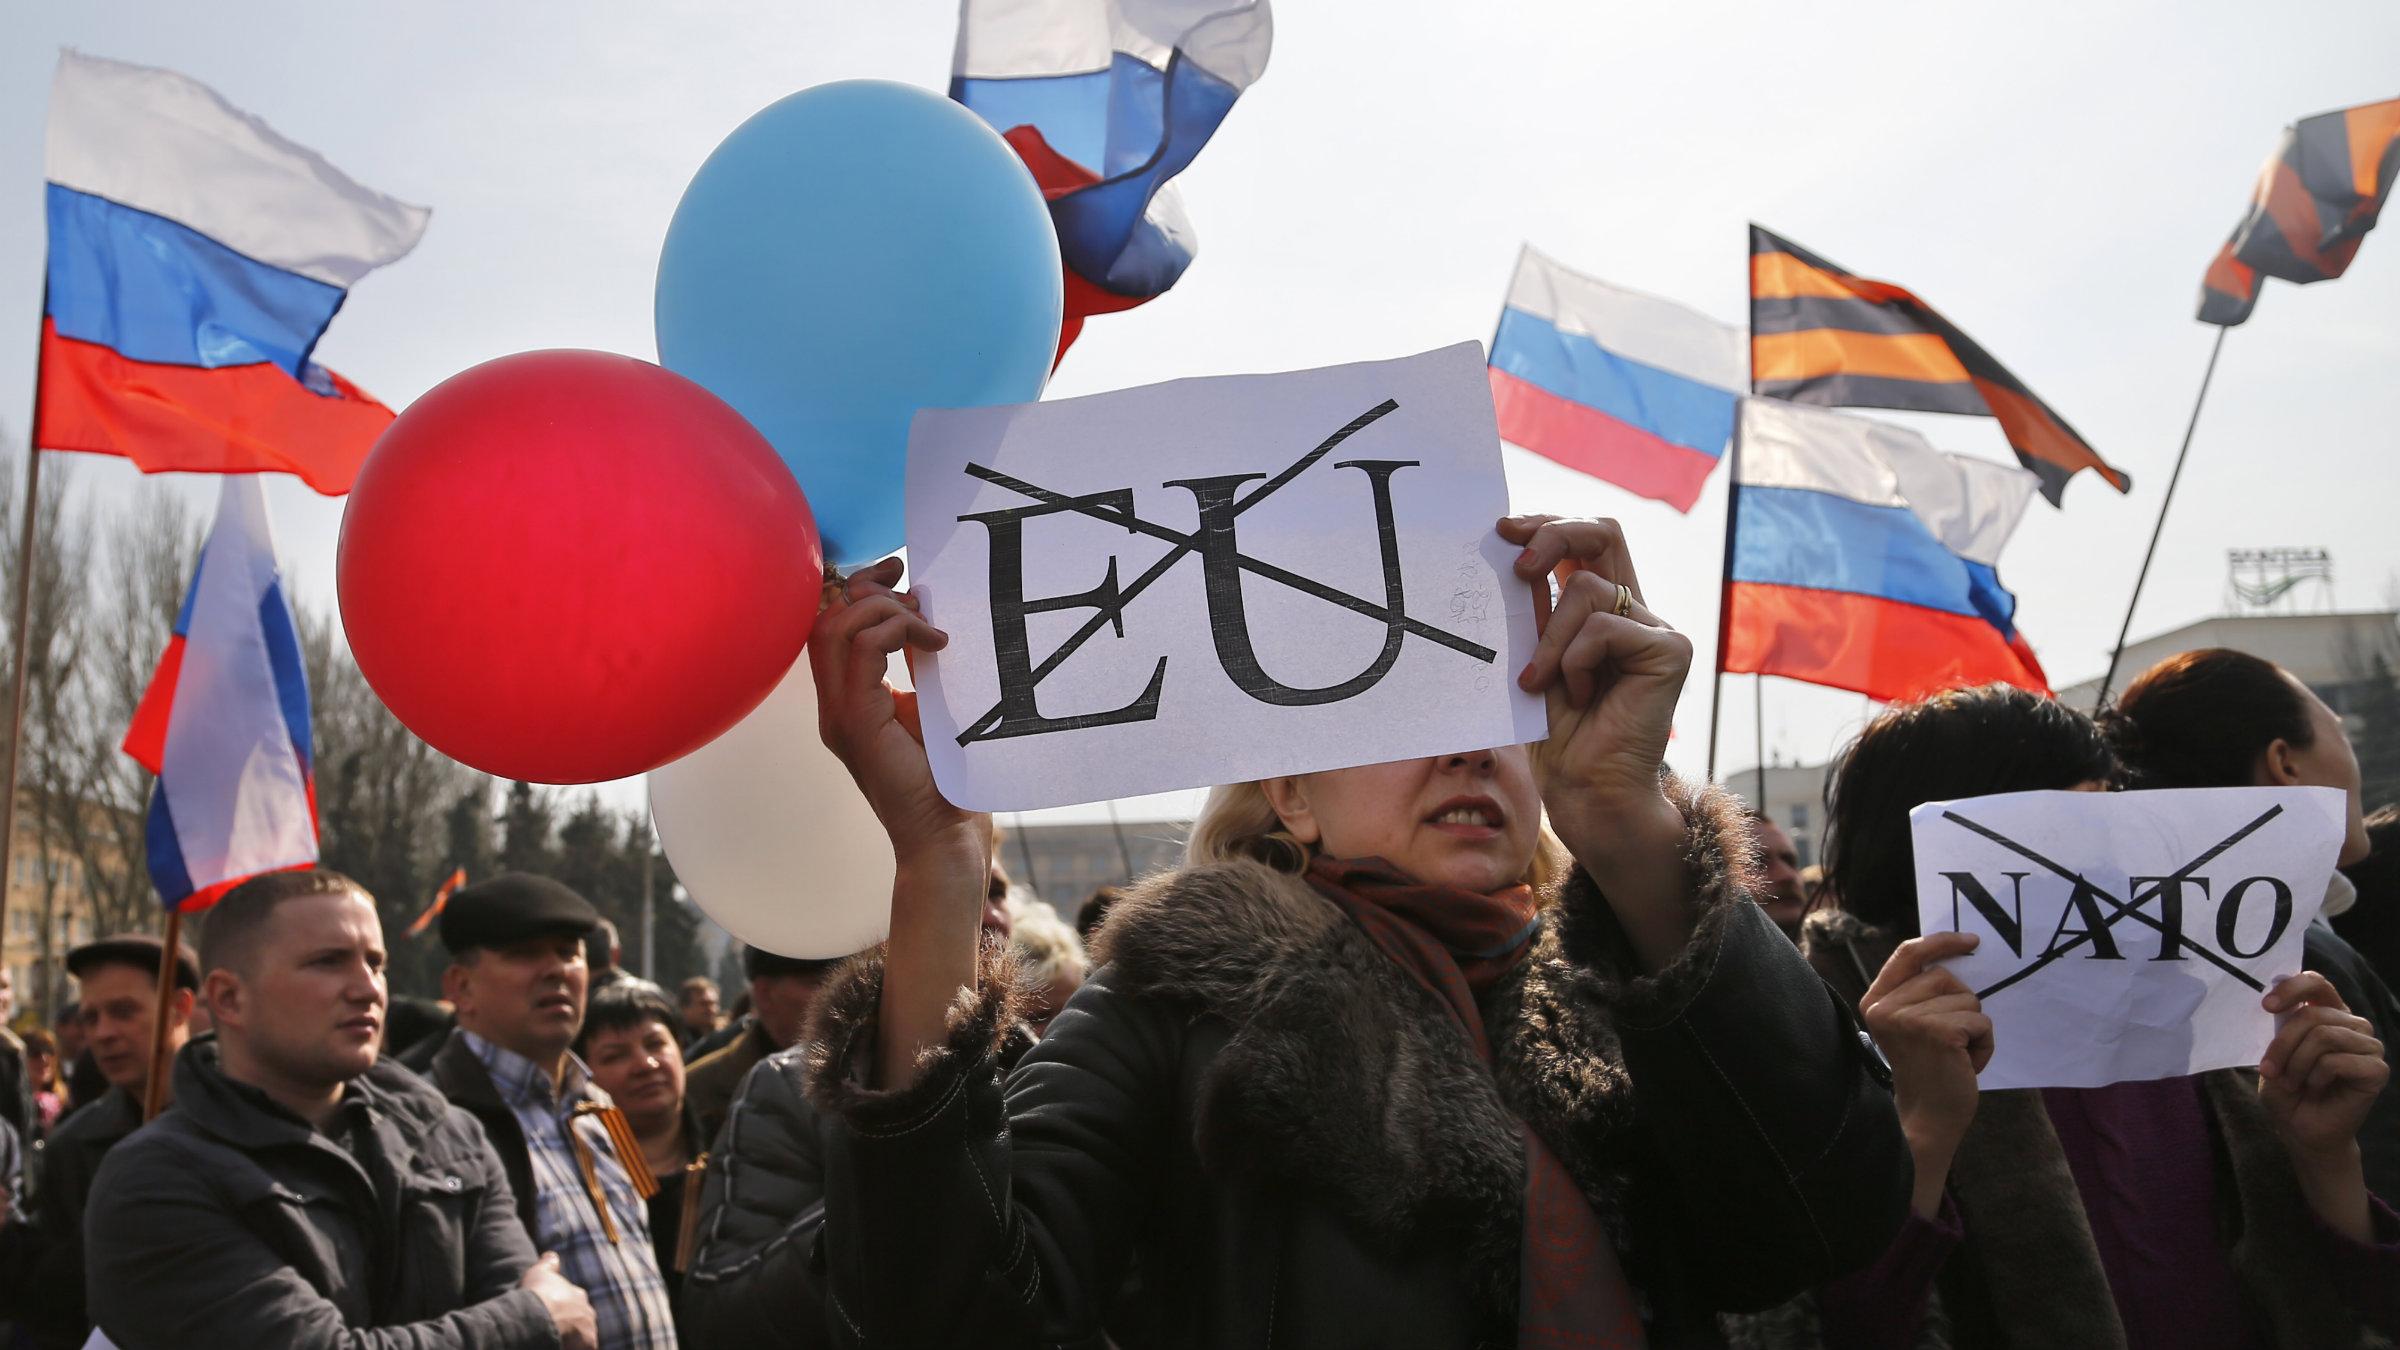 Ukraine demonstrators against EU